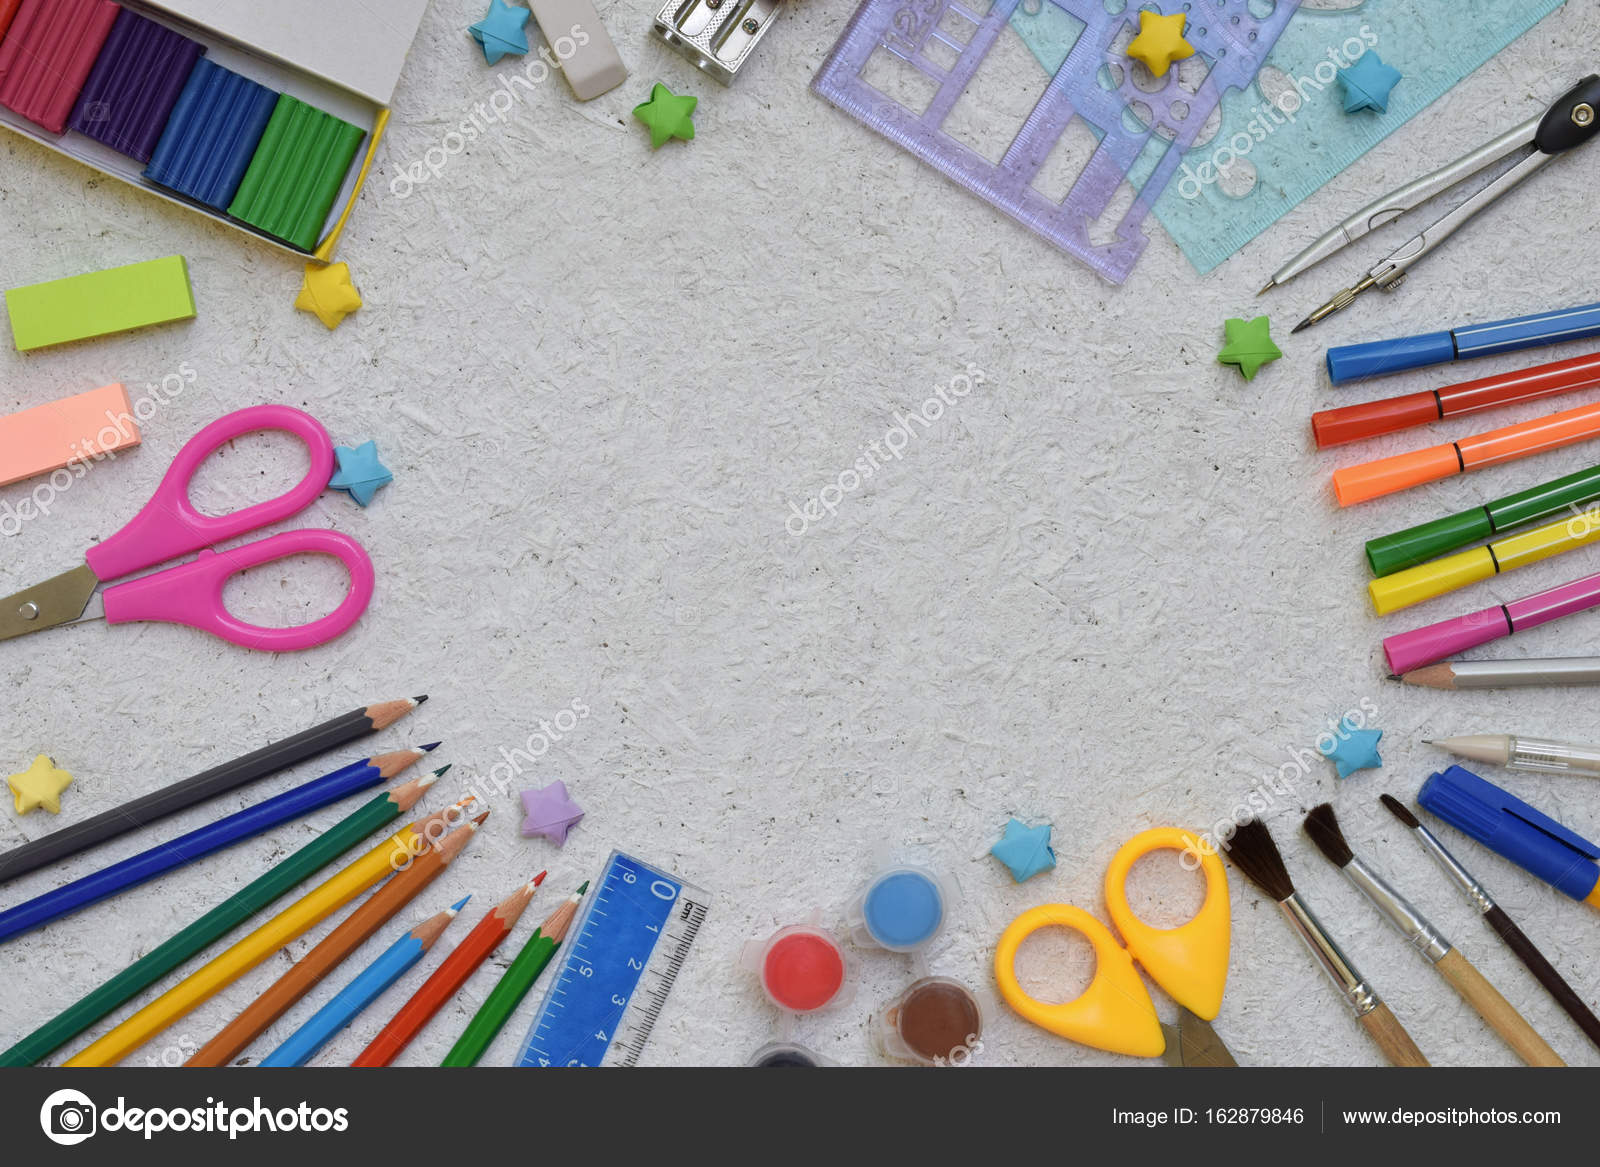 e63a1e1dbe Πλαίσιο της σχολικά είδη  μολύβια